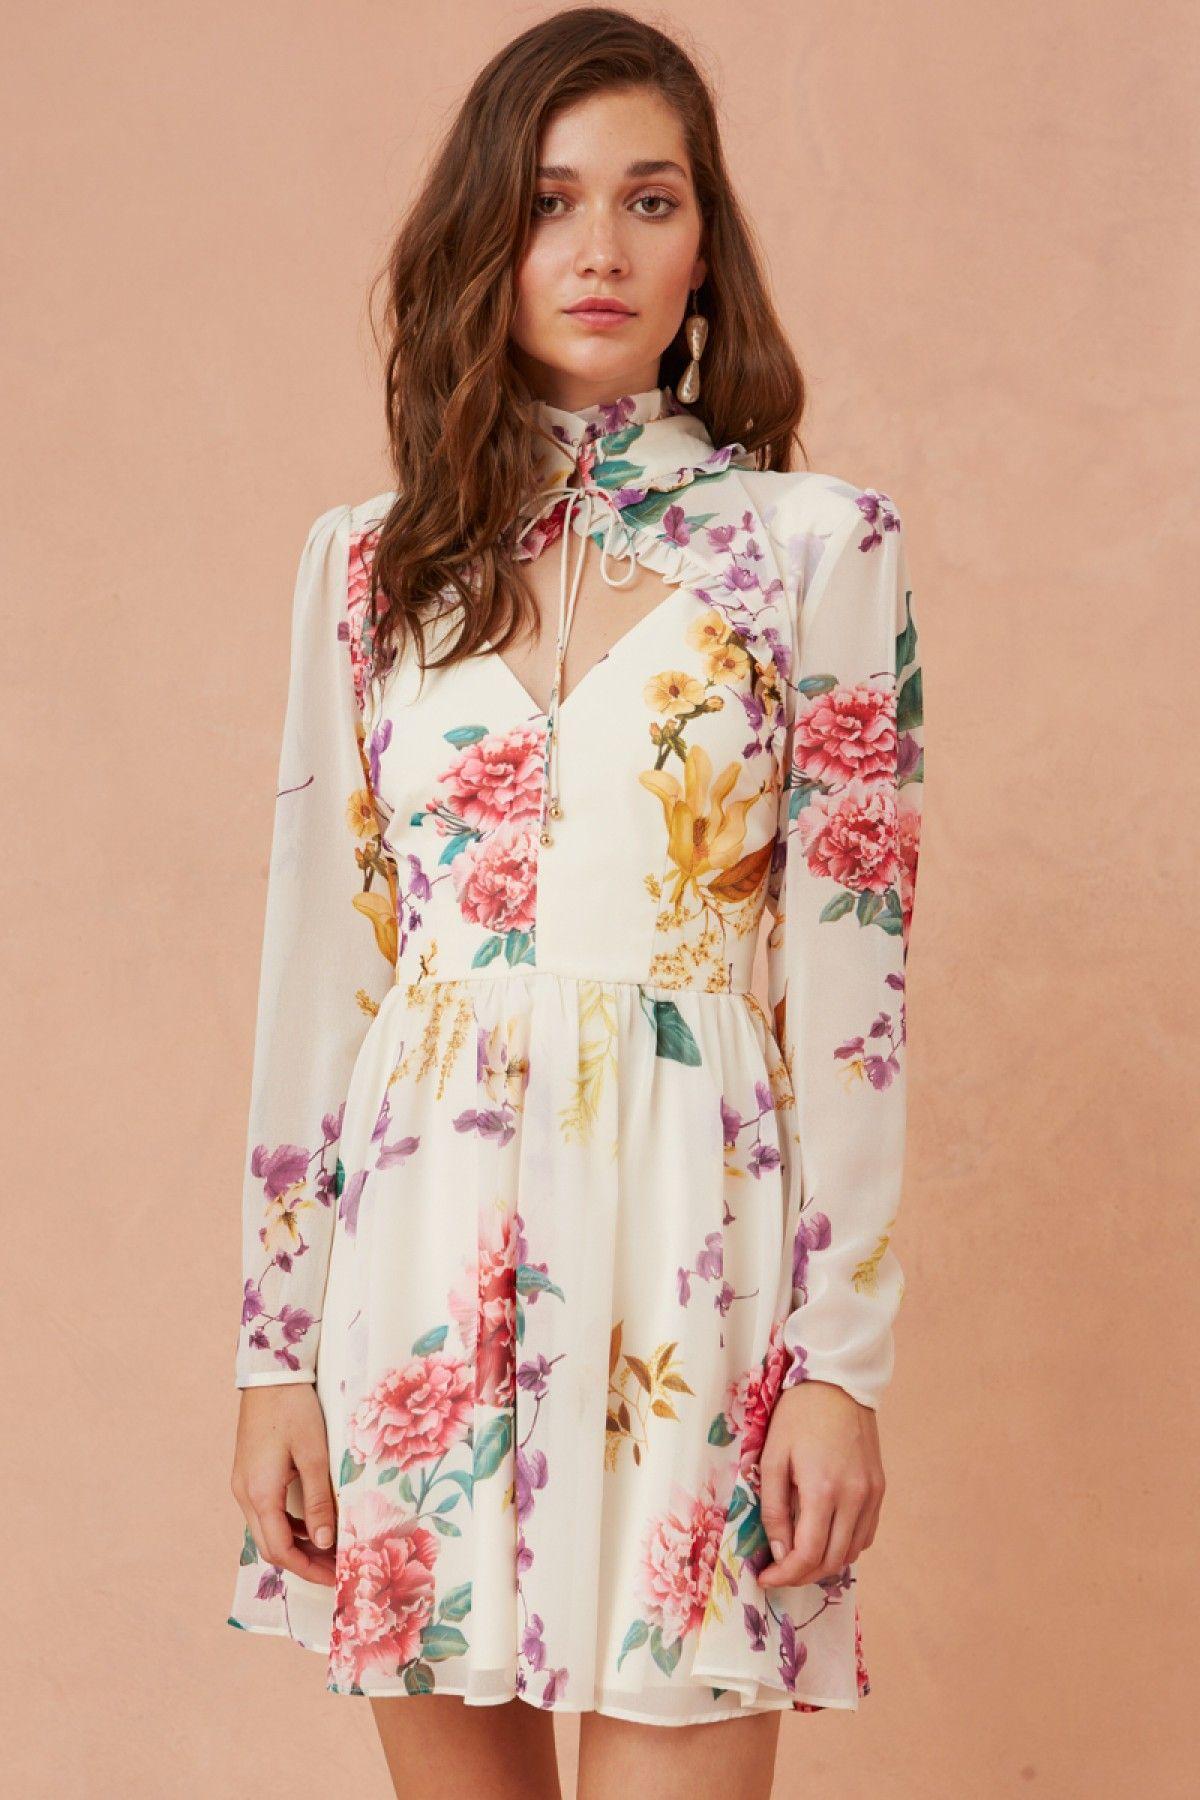 About Us Long Sleeve Mini Dress Creme Botanic Floral Keepsake Bnkr Long Sleeve Chiffon Dress Chiffon Long Sleeve Short Mini Dress [ 1800 x 1200 Pixel ]